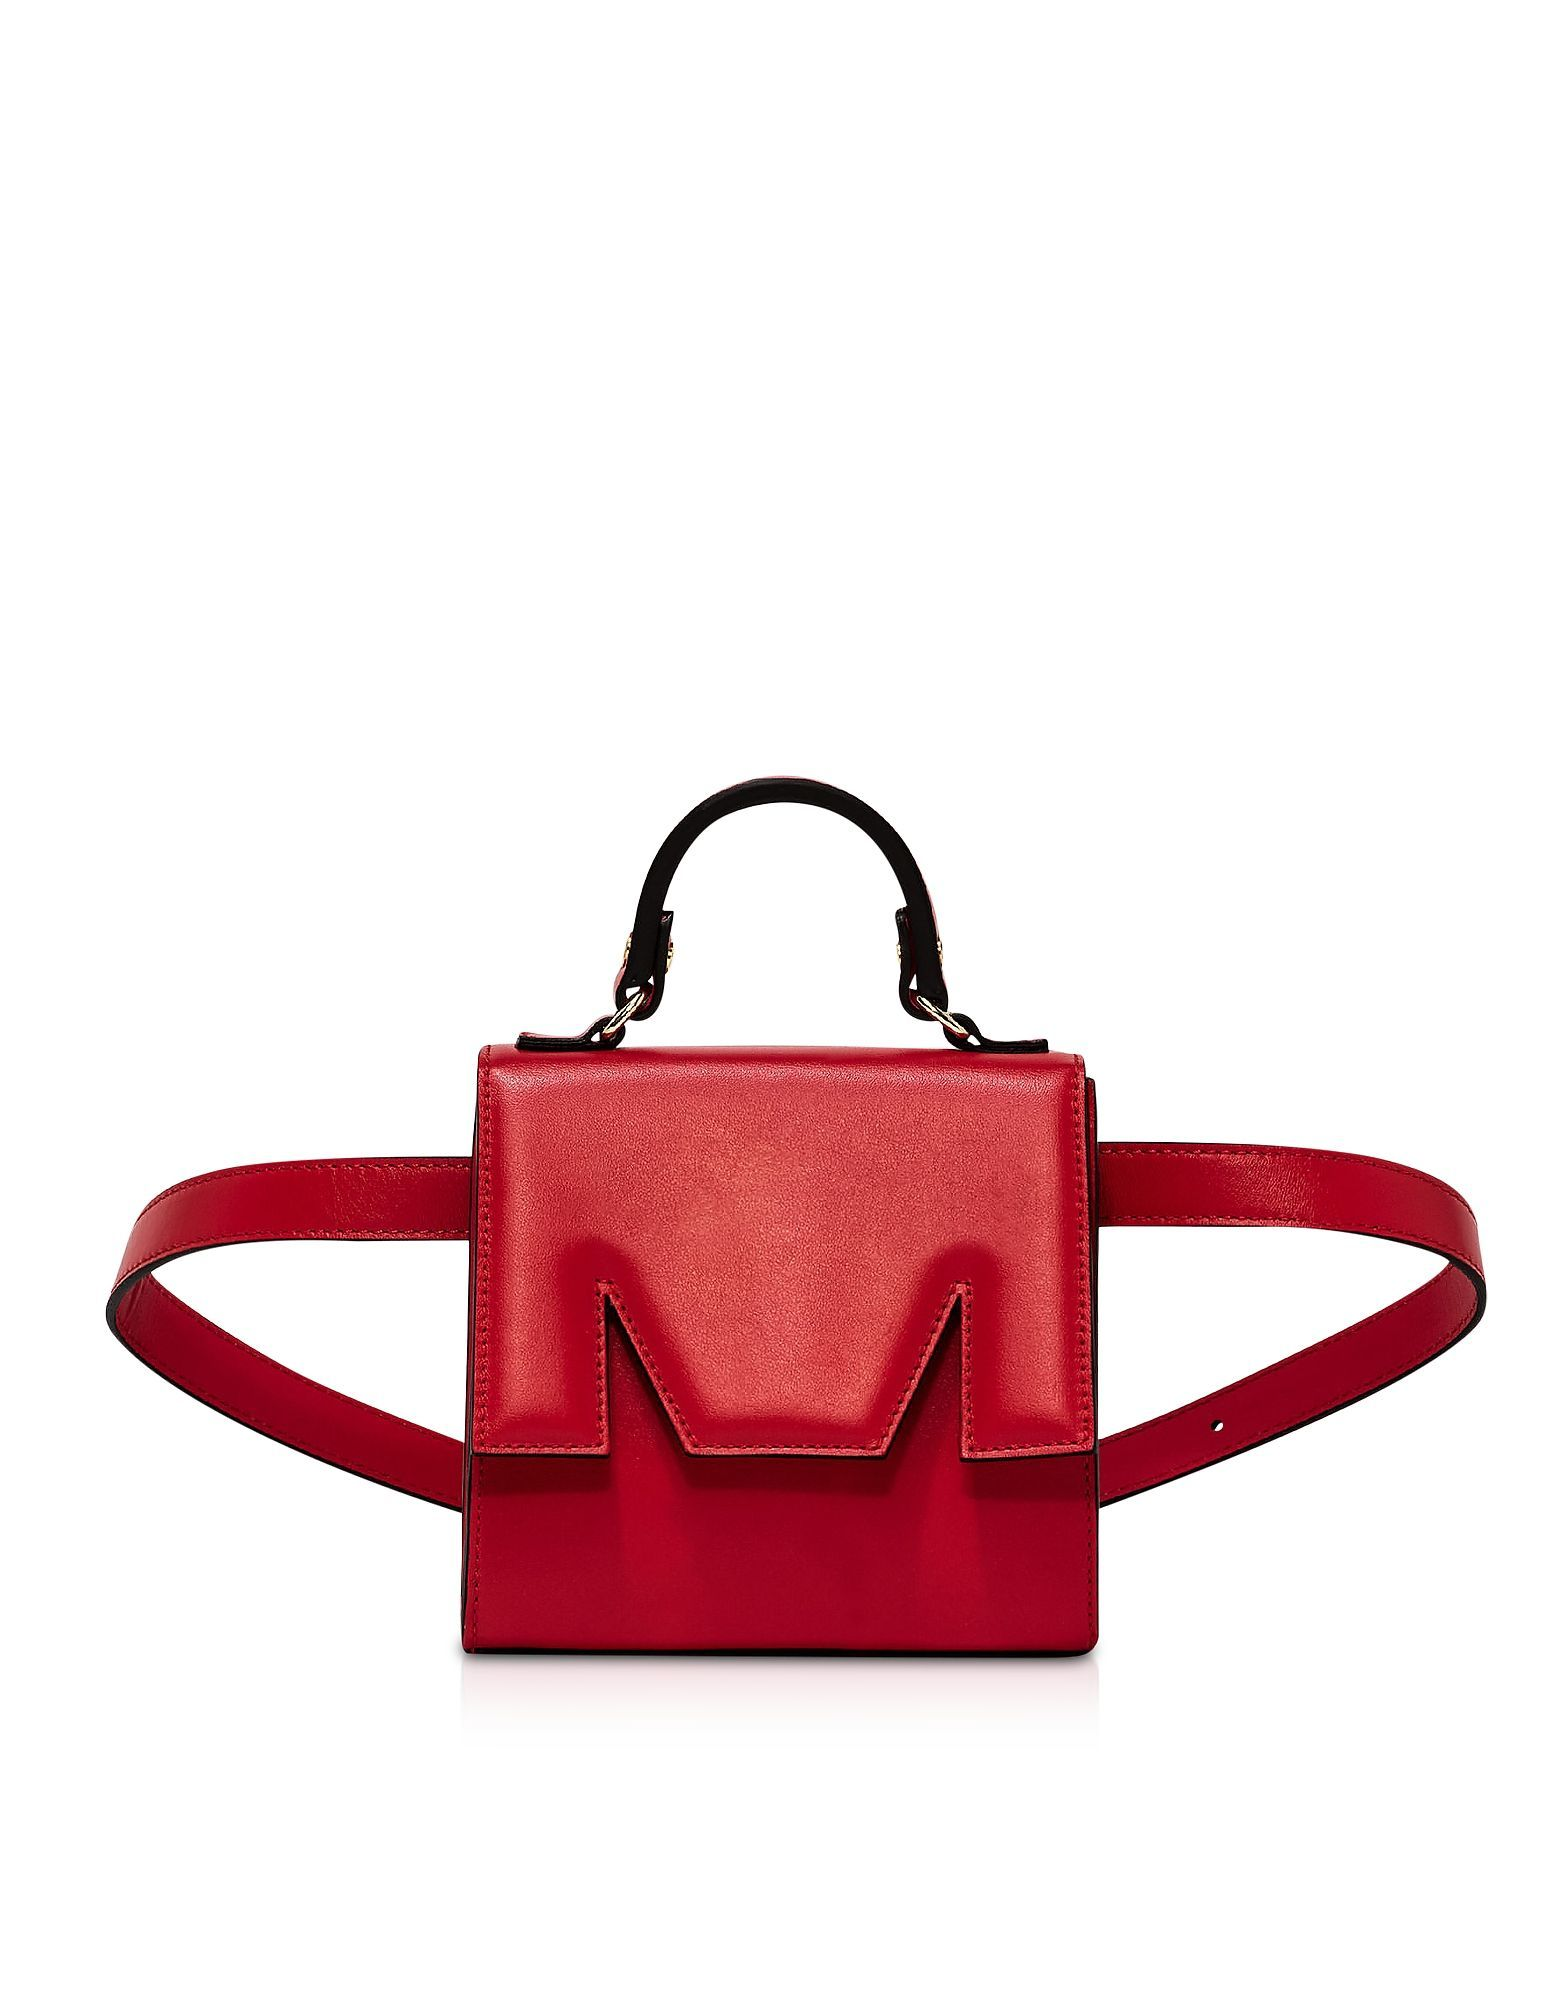 MSGM WOMEN'S 2741MDZ41050018 RED LEATHER BELT BAG